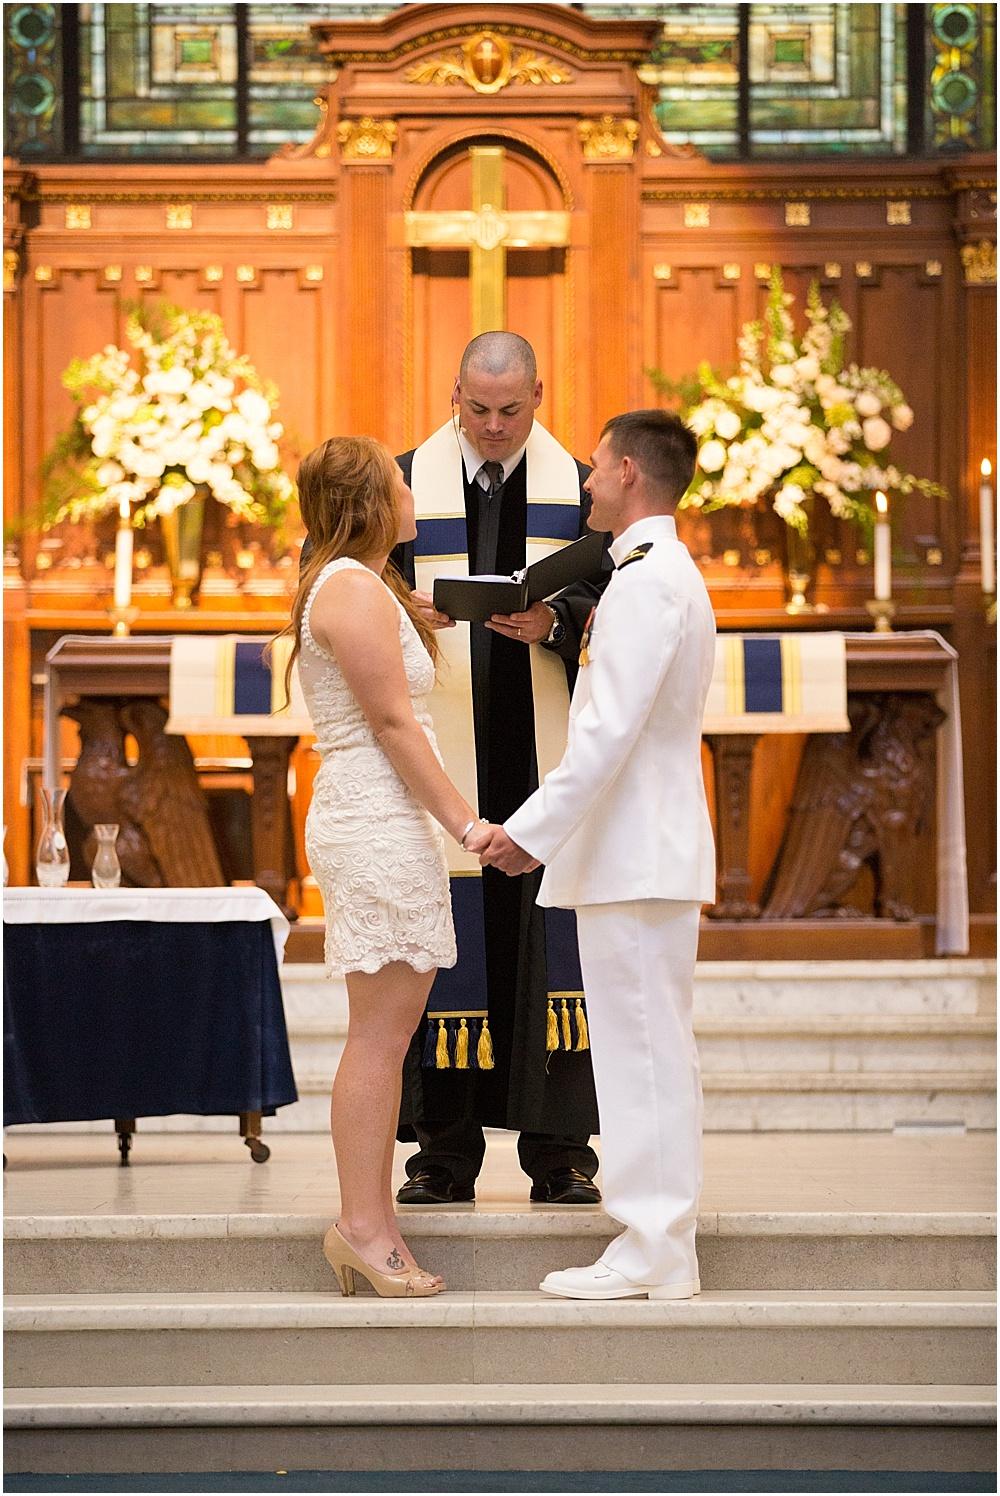 Allison_Nick_United_States_Naval_Academy_Annapolis_Wedding_Photographer_0028